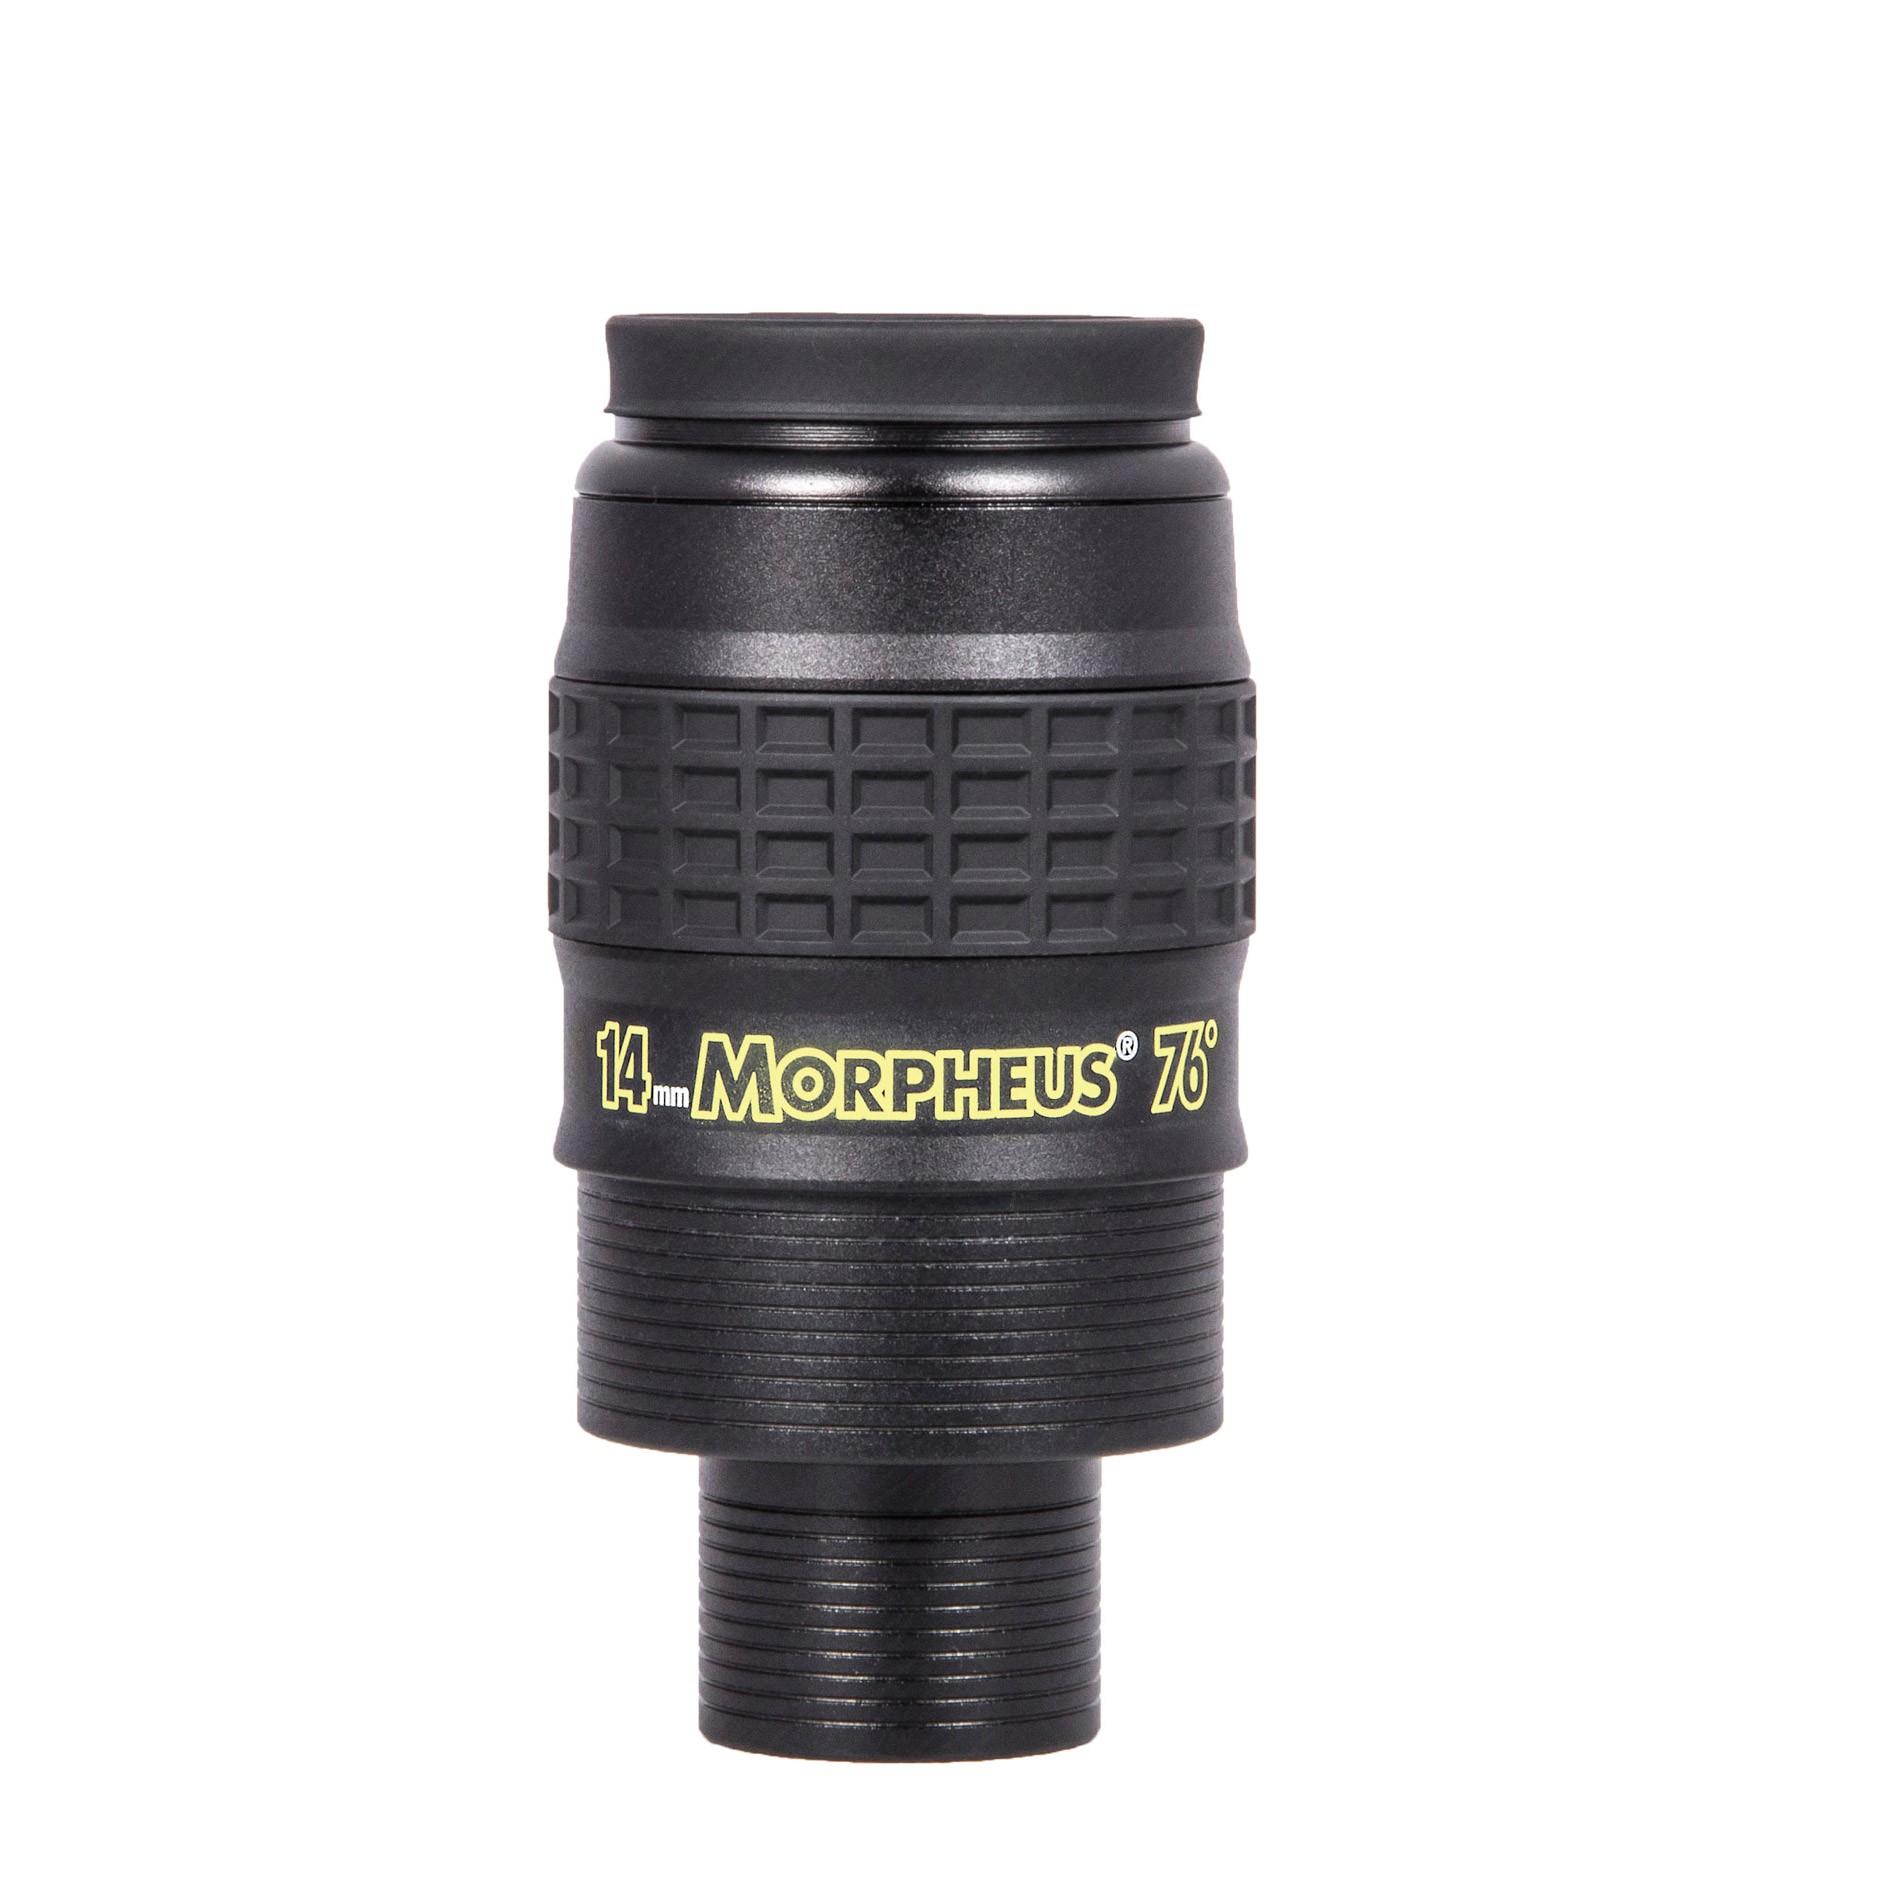 14 mm Morpheus 76° Weitwinkel-Okular